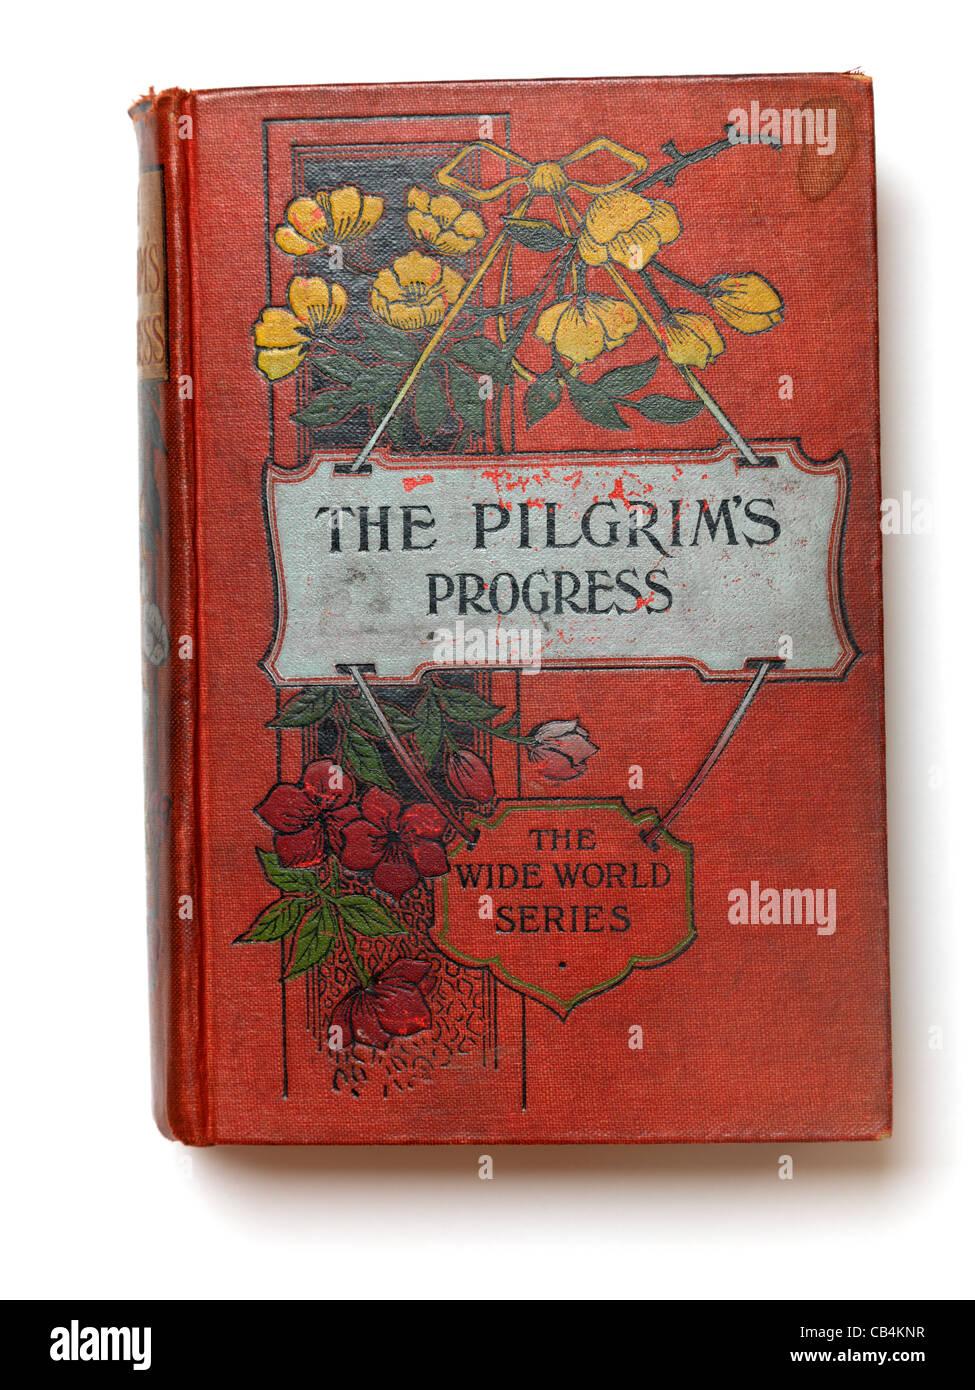 Cover Of The Pilgrim's Progress Book - Stock Image